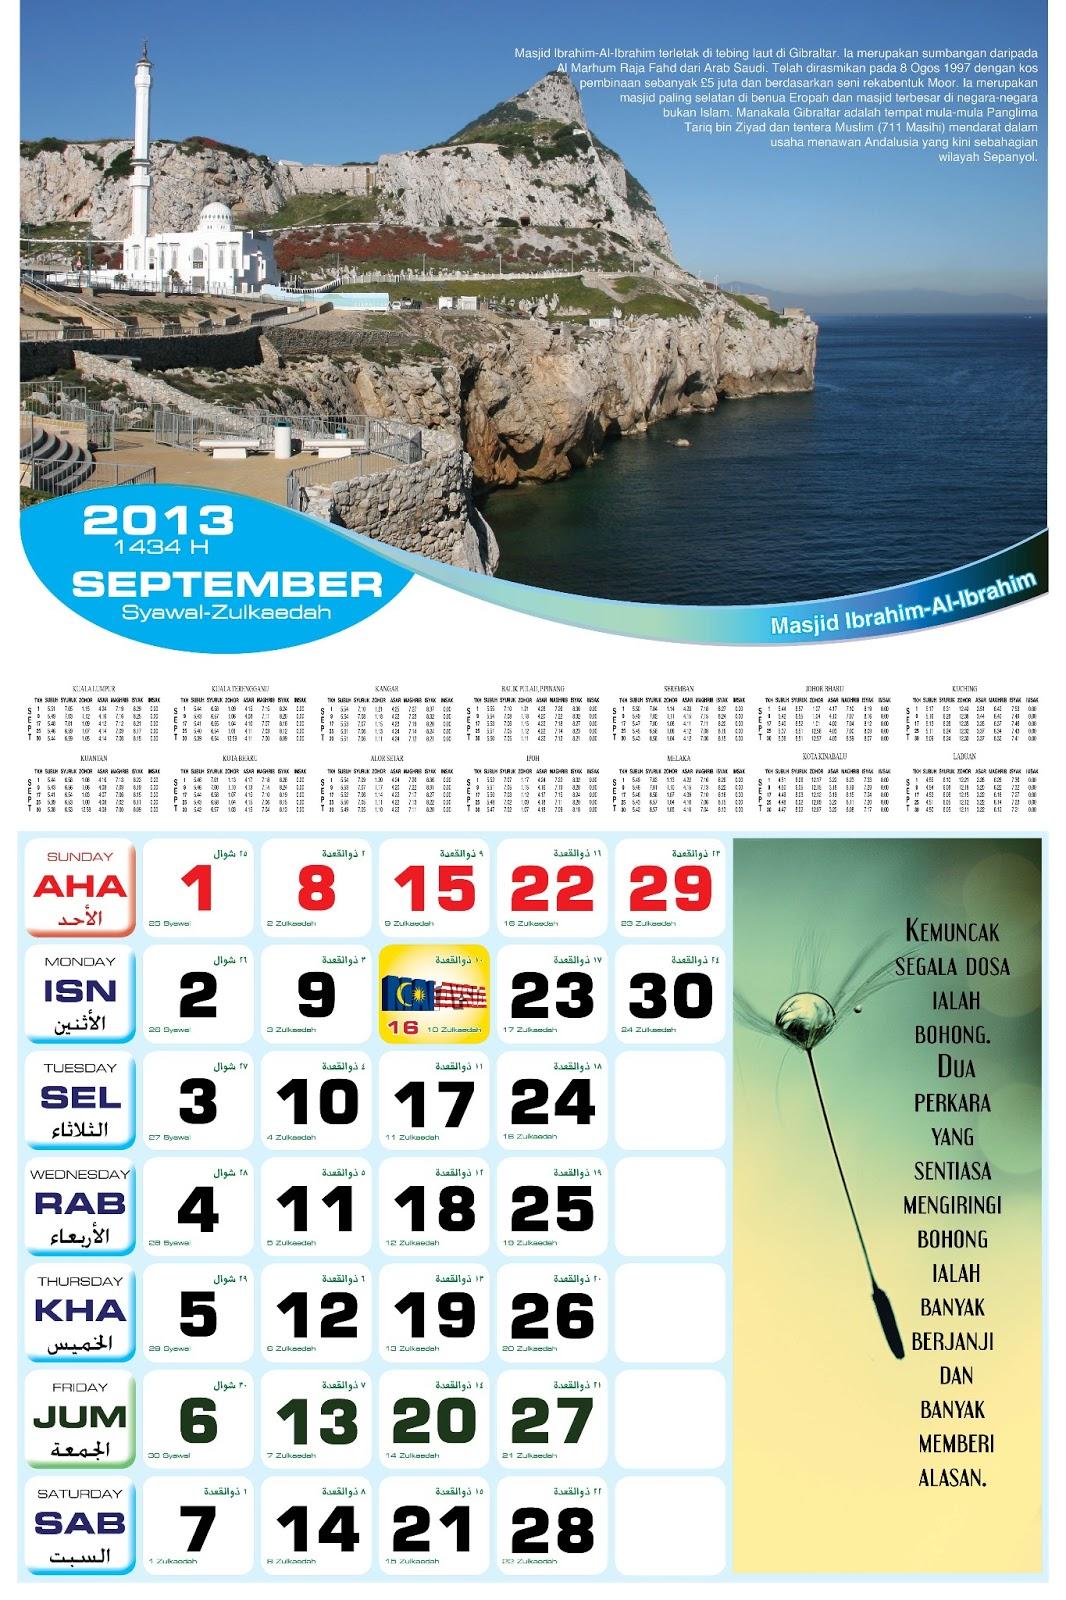 Wport 2013 Wall Calendar Designs